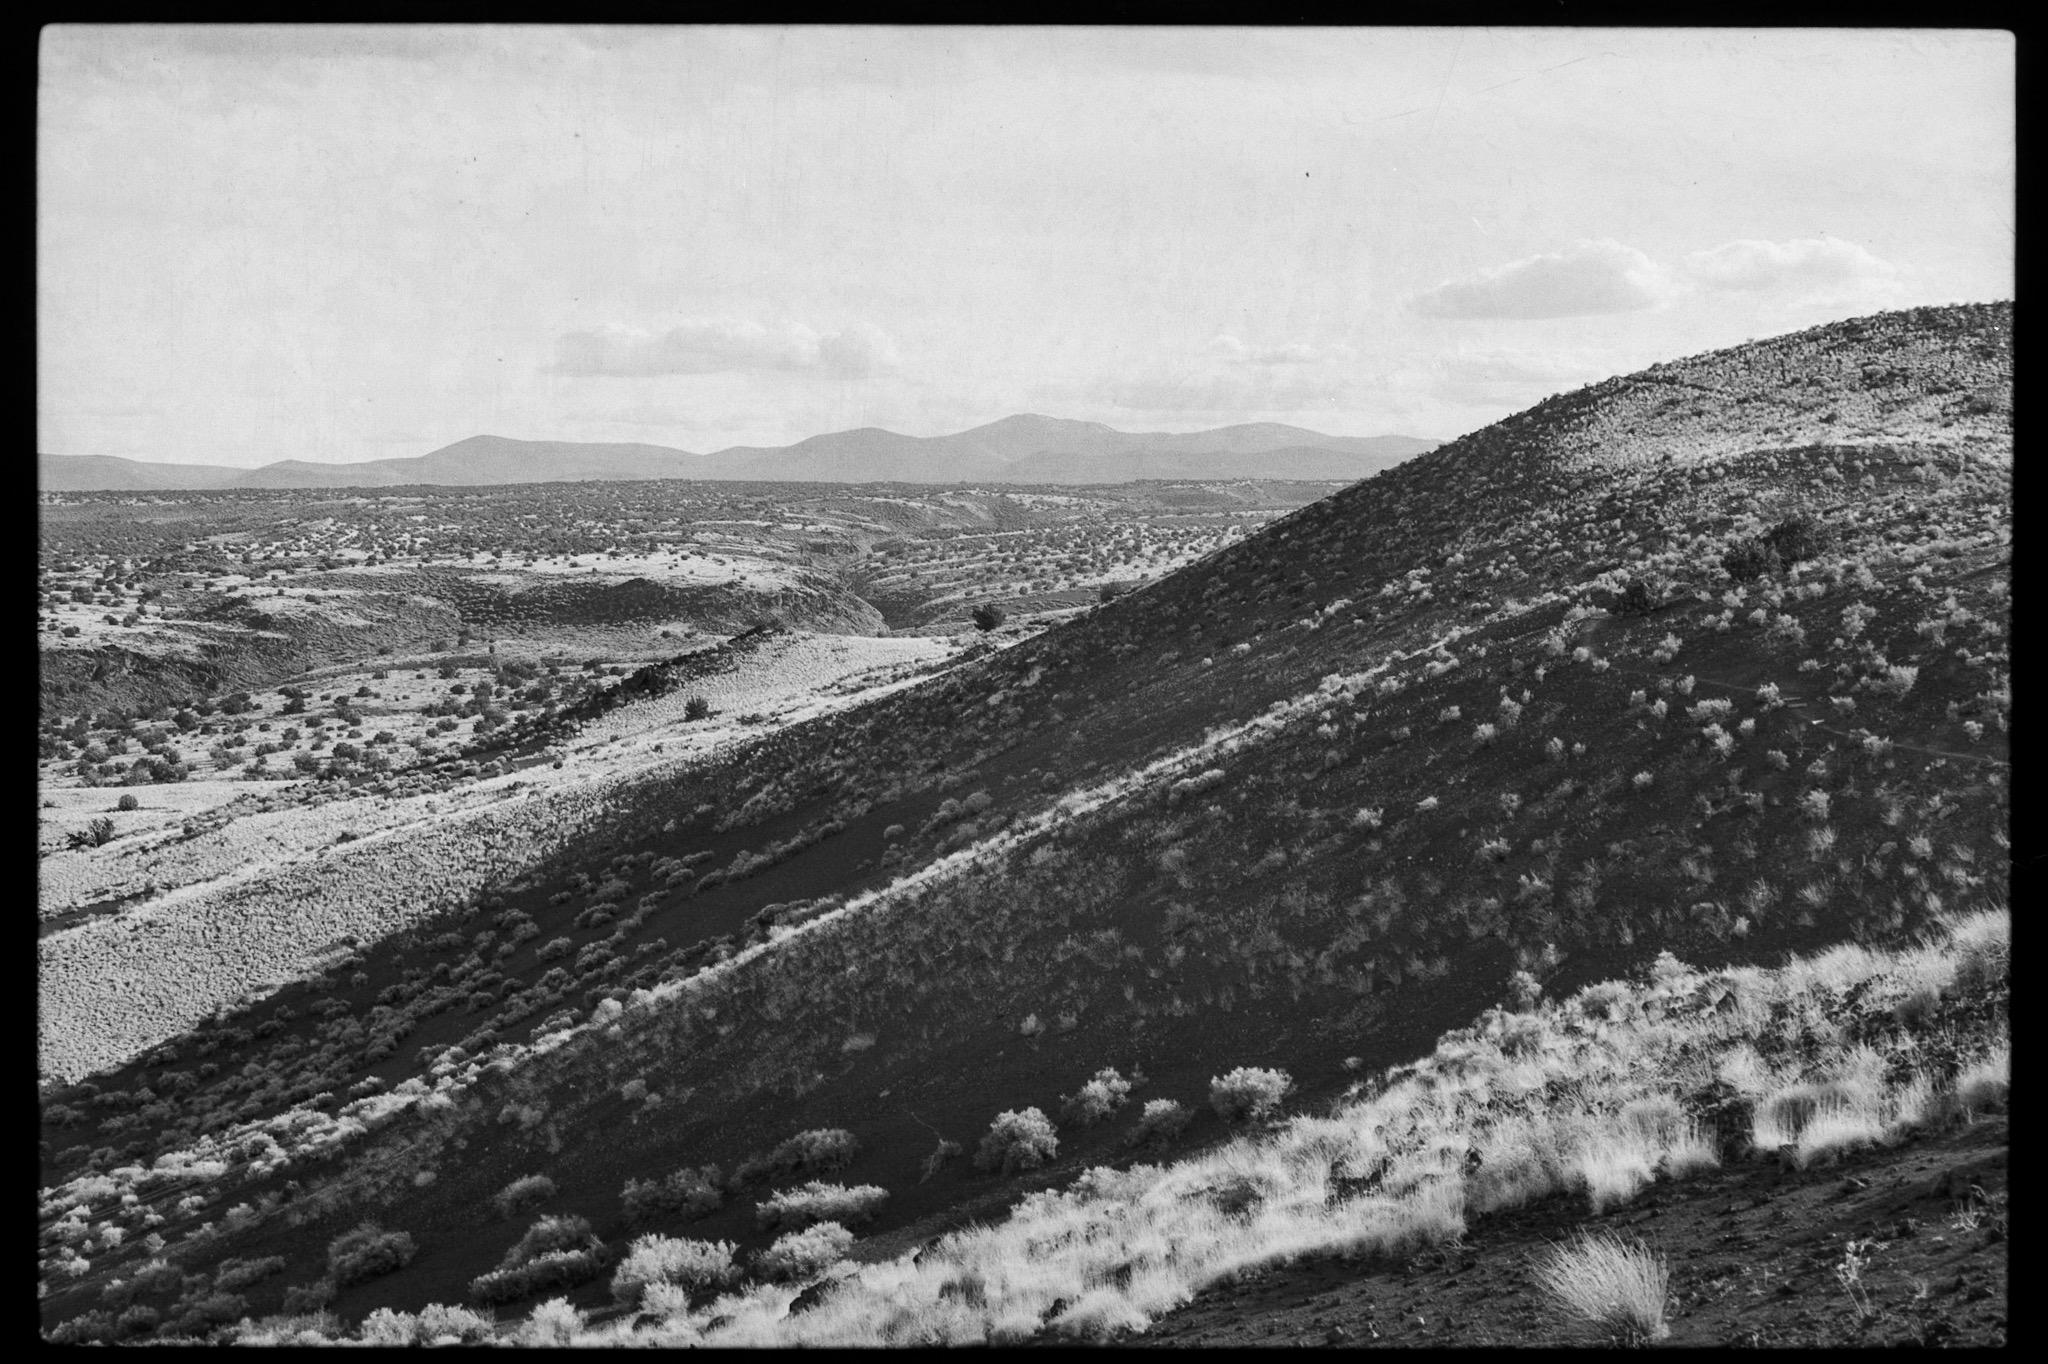 Terrain around Doney Mountain, Coconino County, Arizona